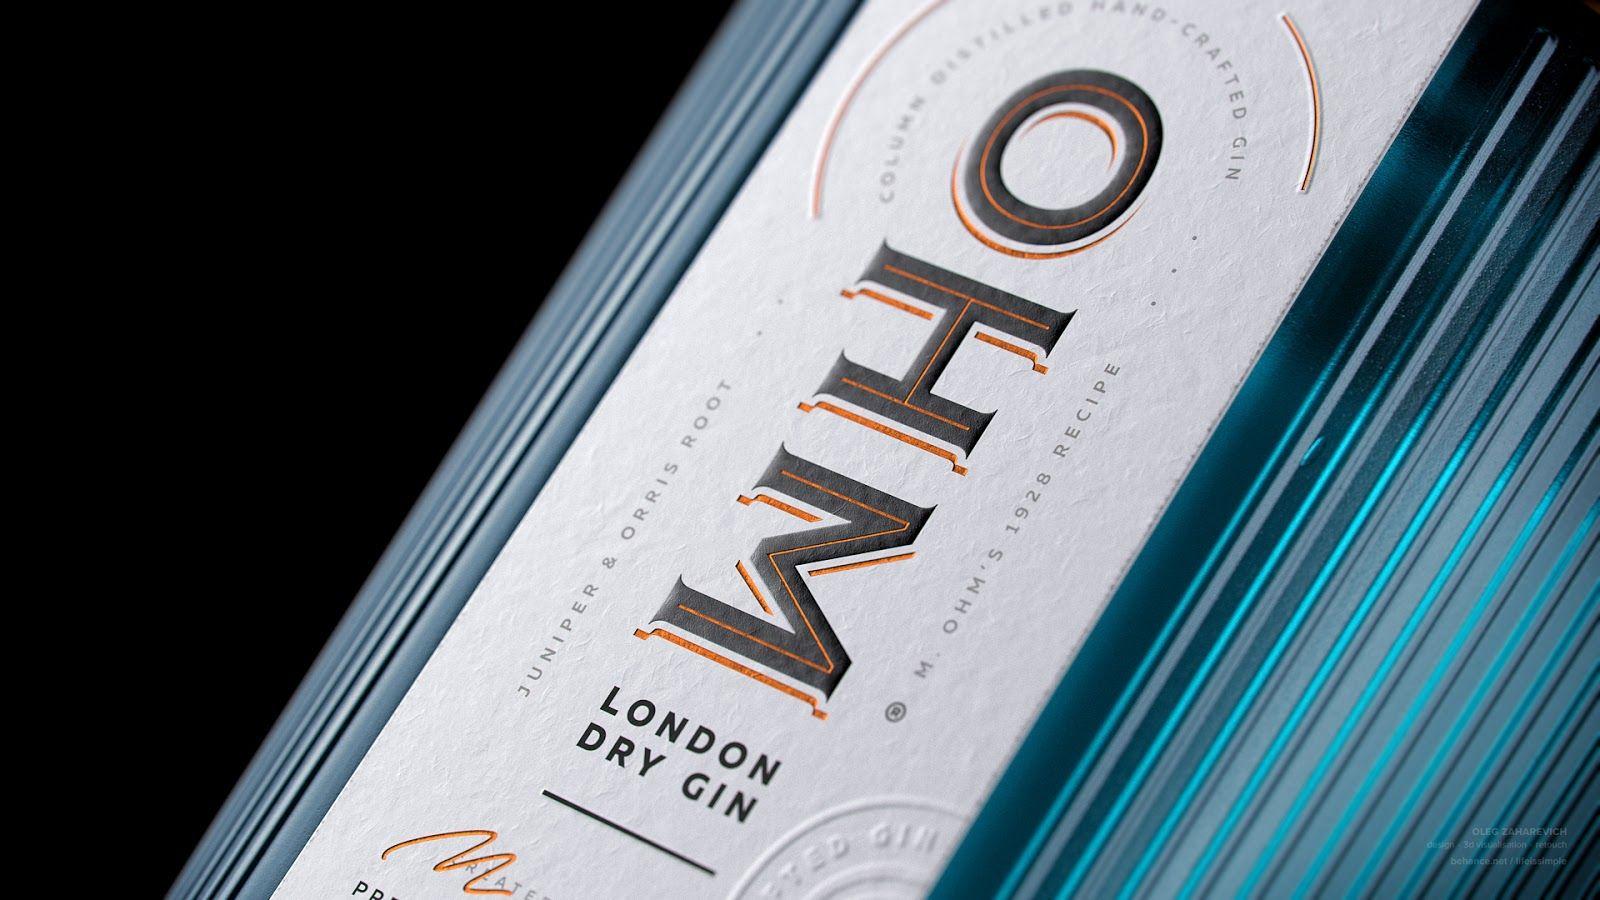 OHM London Dry Gin